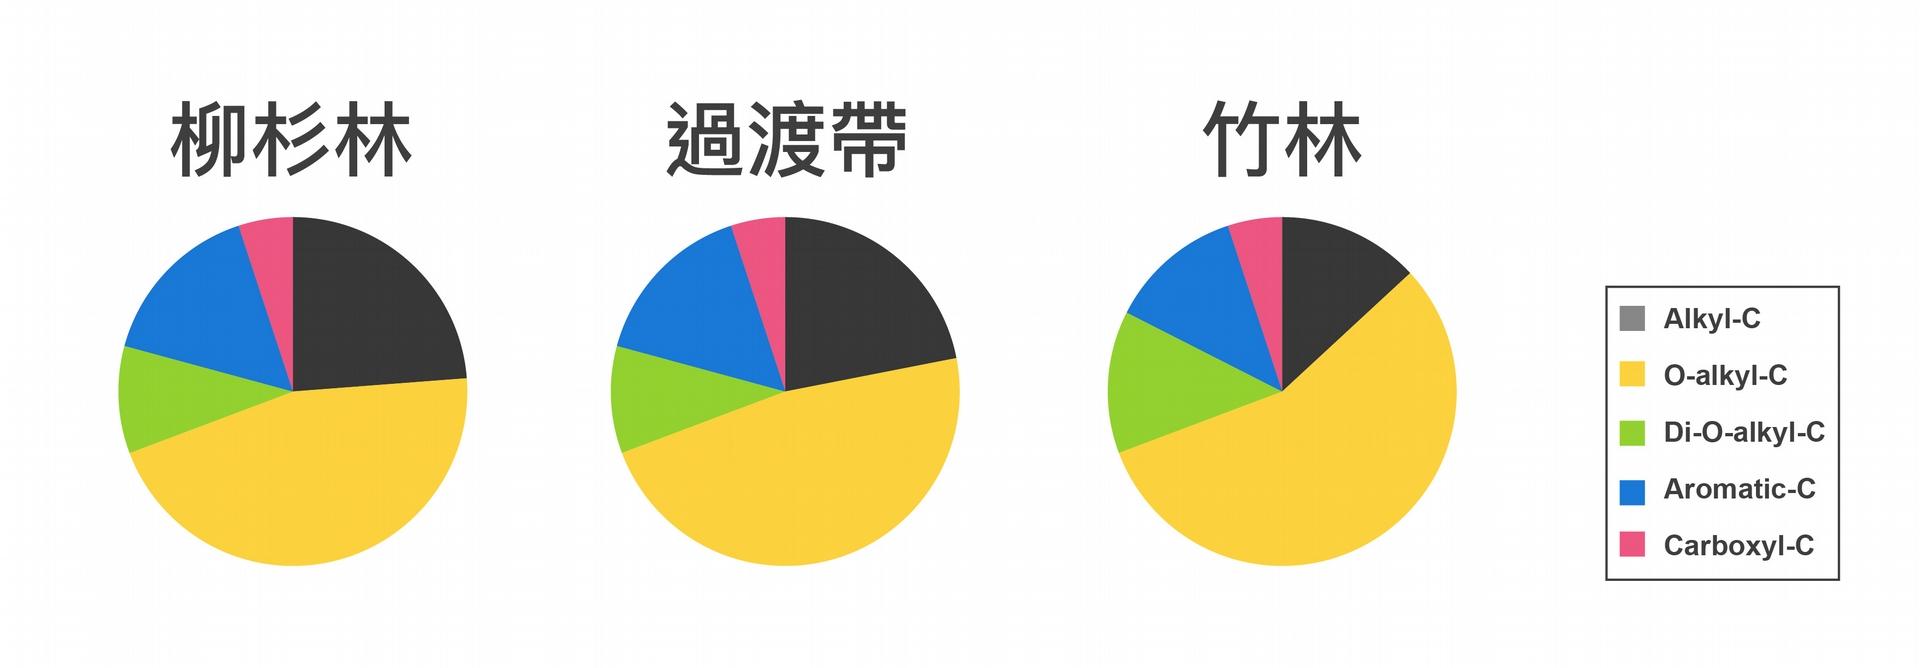 "竹林枯枝落葉中,氧烷基碳成分最高(黃色和綠色,相當於易分解部分);烷基碳成分最低(黑色,相當於耐分解部分)。顯示出相較於杉木林的枯枝落葉,竹林的枯枝落葉更易於分解。資料來源│Wang, H.C., Tian, G., and Chiu, C.Y.* , 2016, ""Invasion of moso bamboo into a Japanese cedar plantation affects the chemical composition and humification of soil organic matter. "", Scientific Reports, 6, 32211. 圖說重製│廖英凱、張語辰"